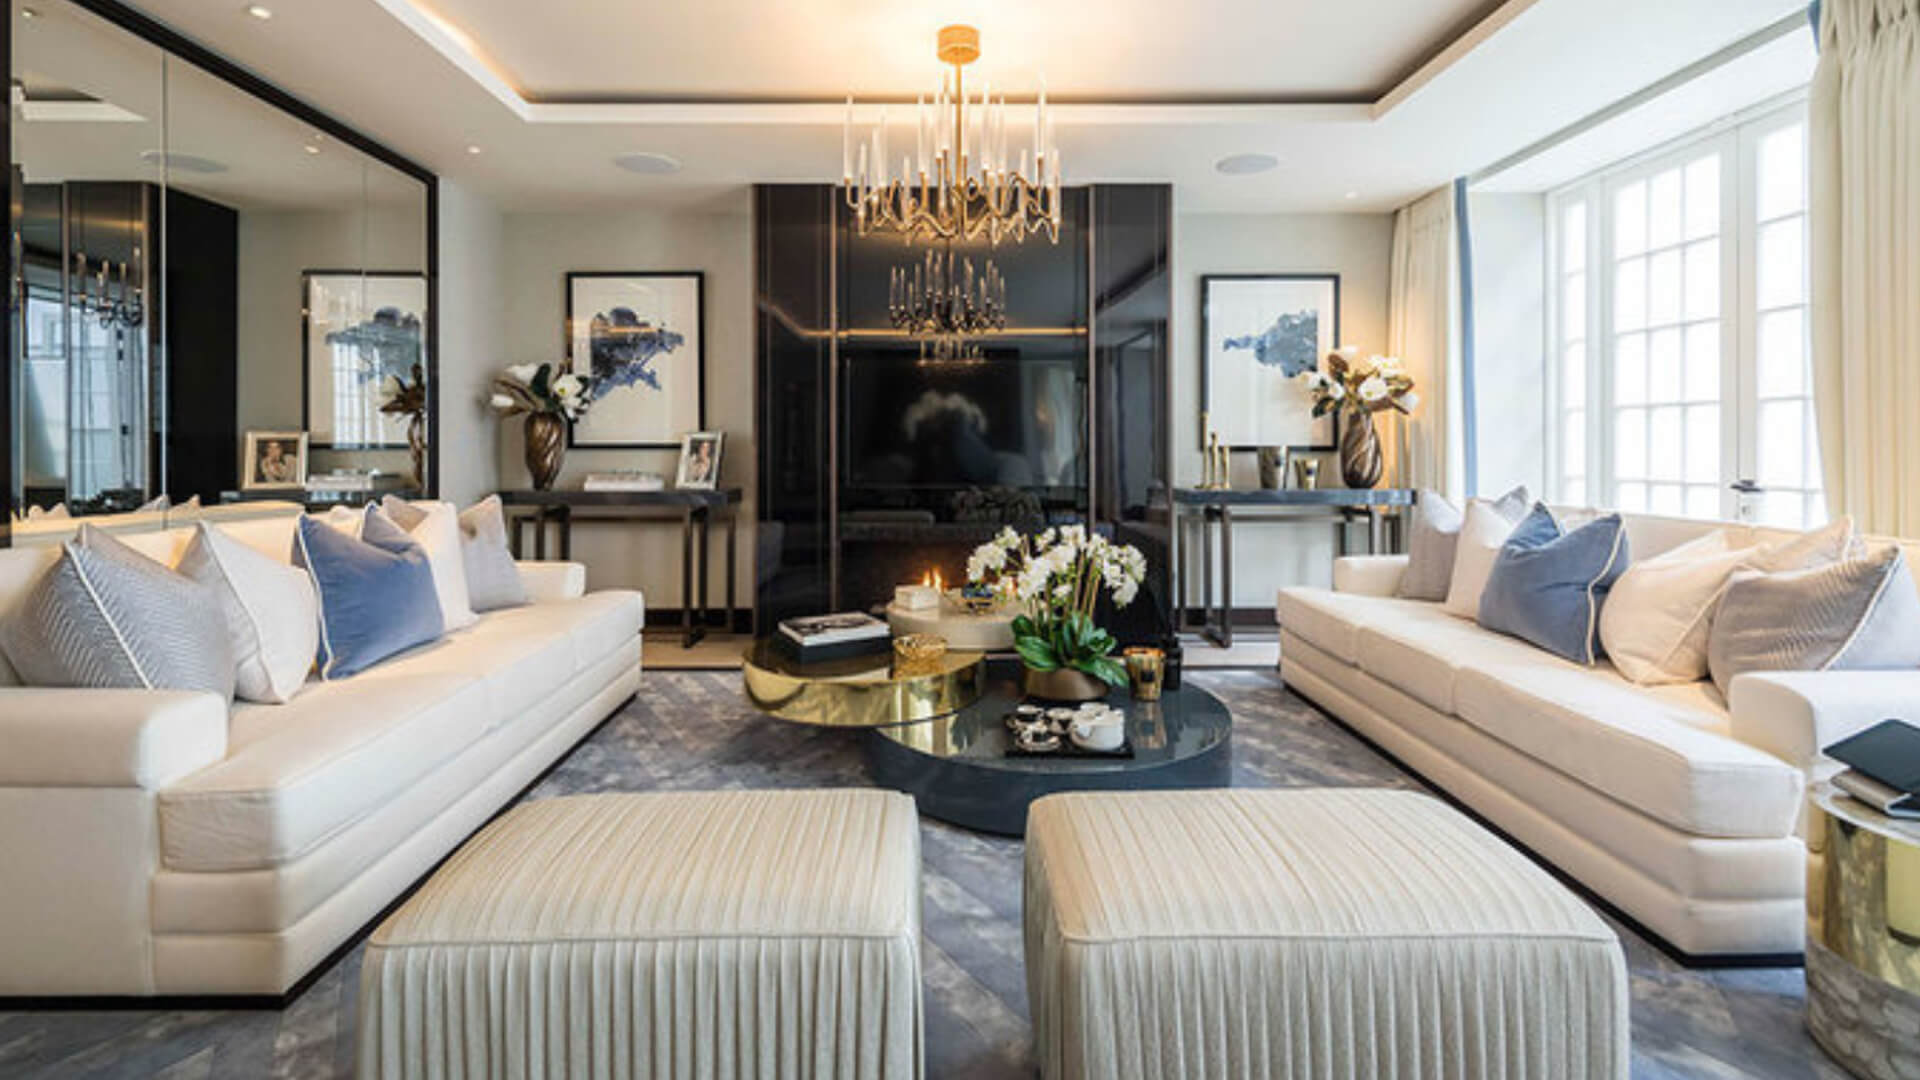 Luxury Mayfair Mansion- Lux Life luxury lifestyle magazine